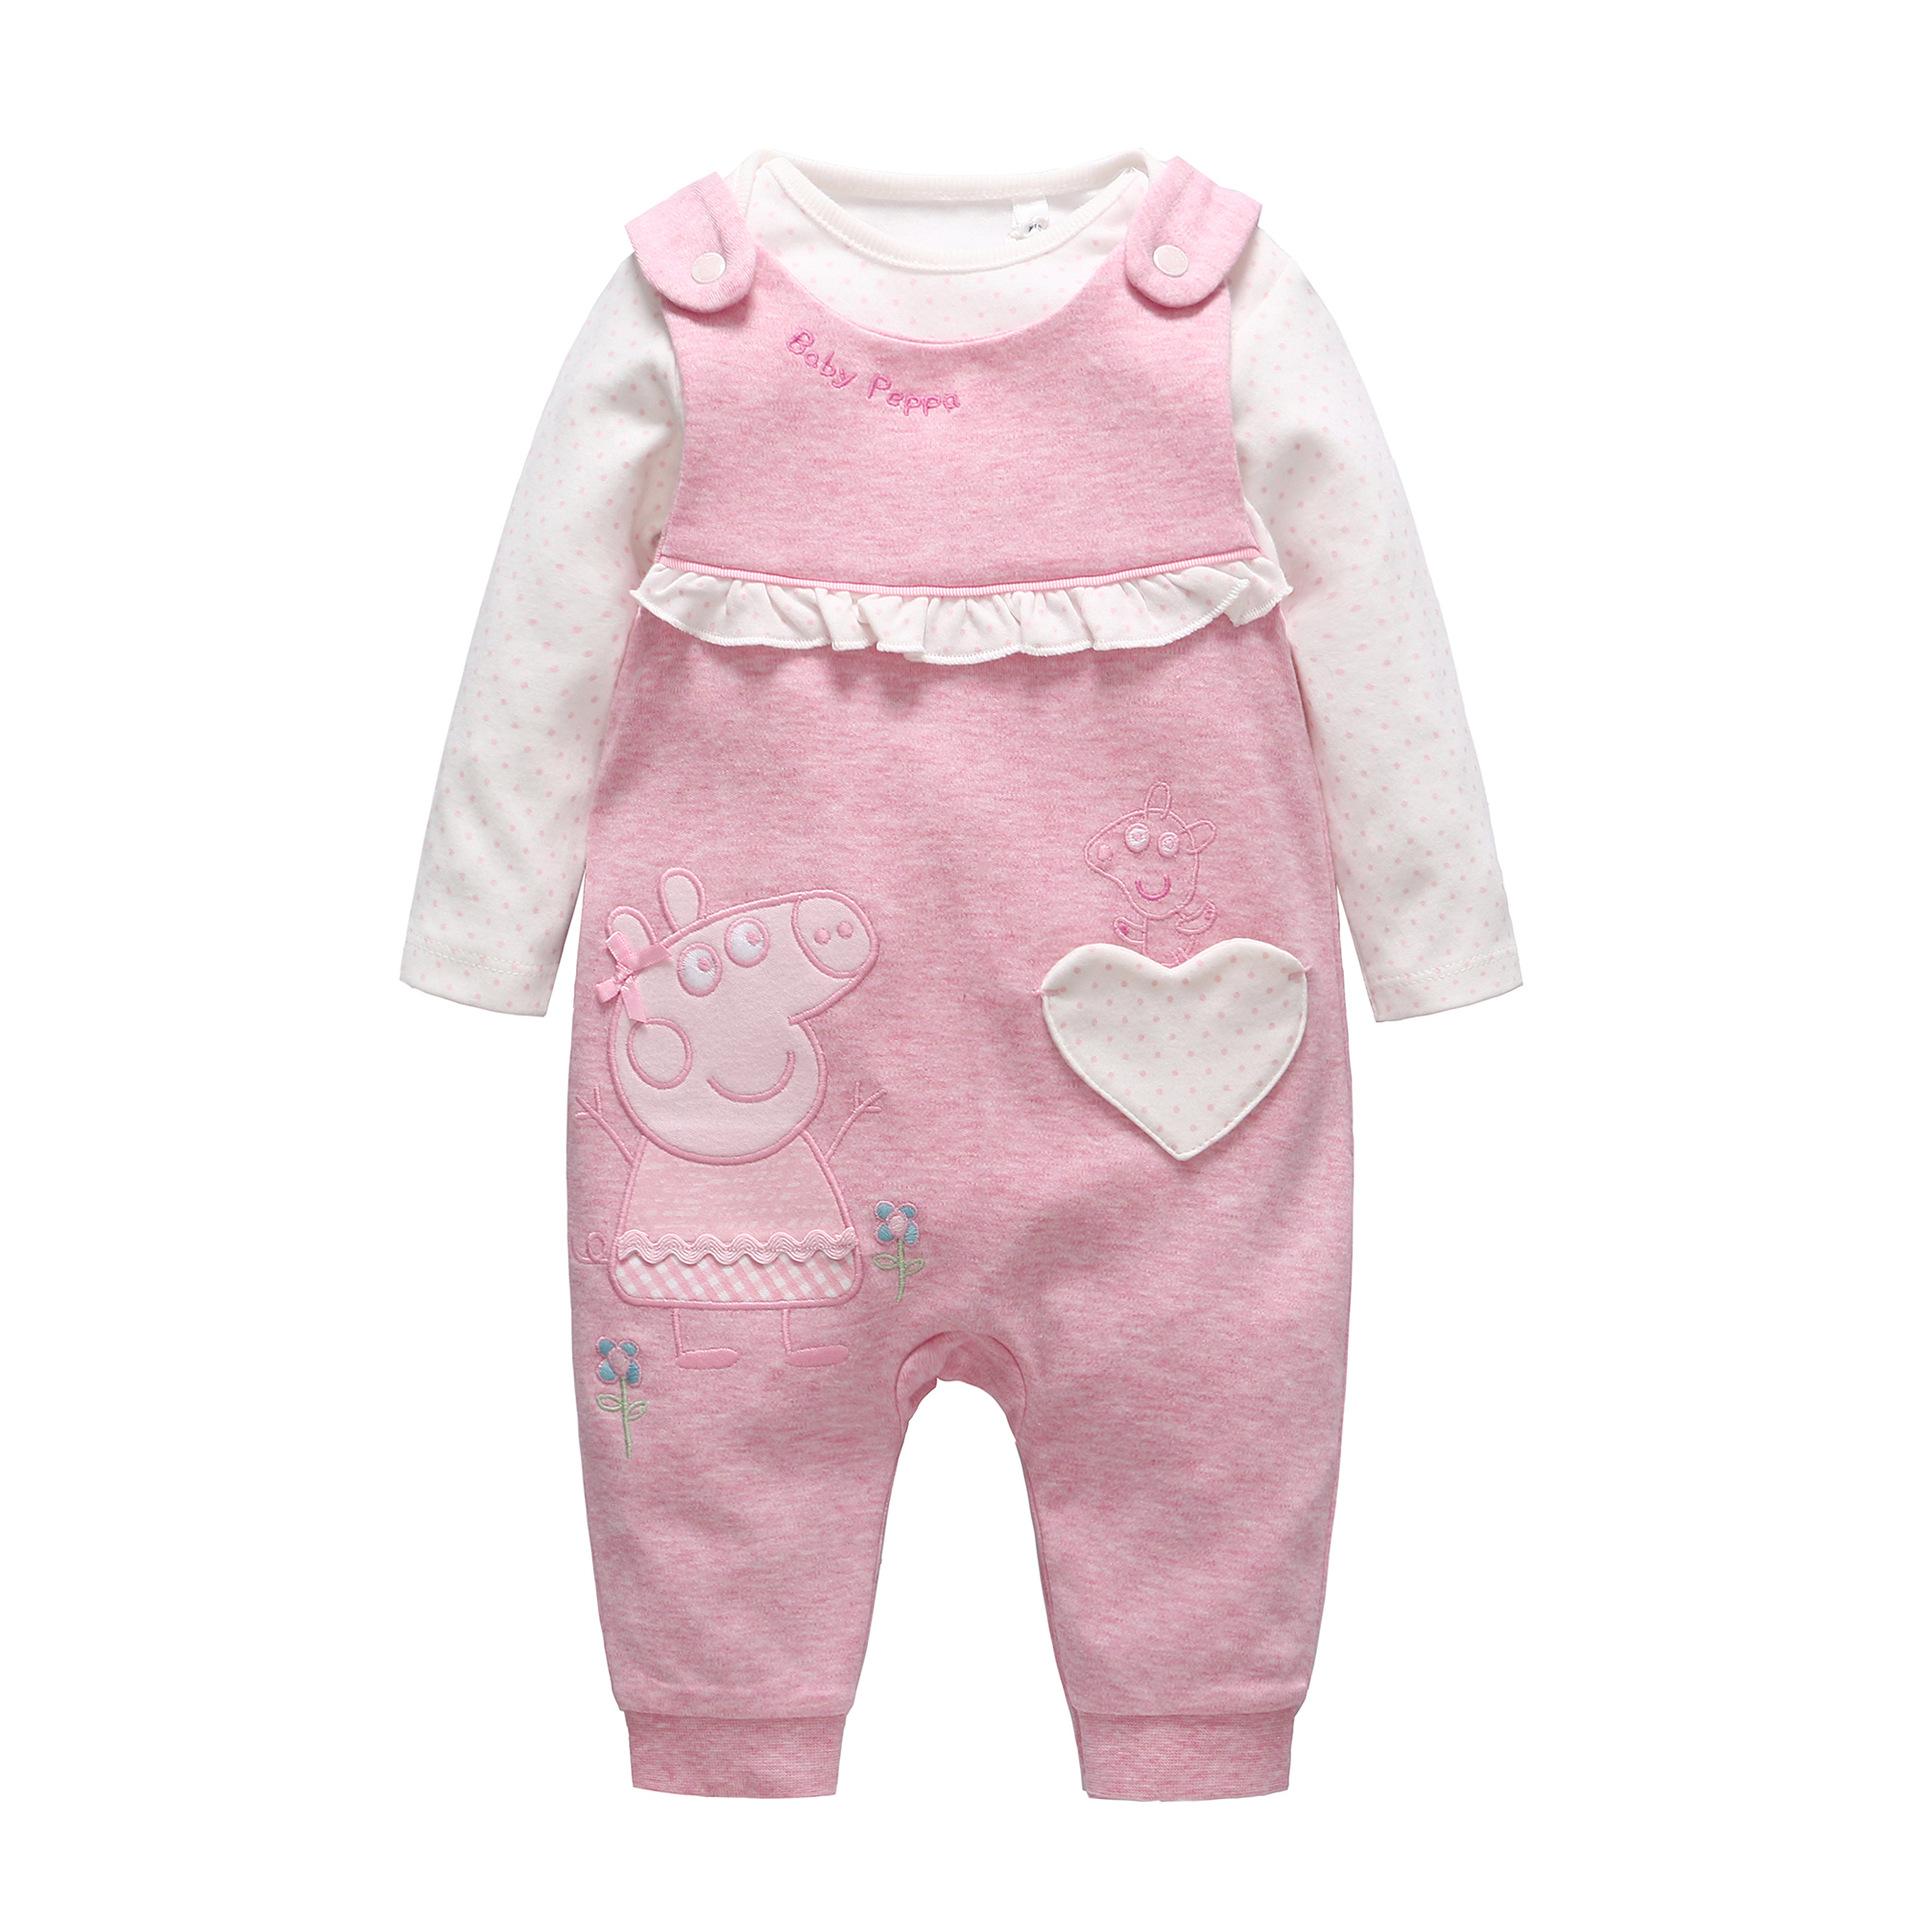 2016 Autumn Cartoon Pig Baby Set Baby Girl Cotton Dot Long-sleeve Romper+Love Pattern Pants 2pcs Set New Born Baby Girl Clothes(China (Mainland))